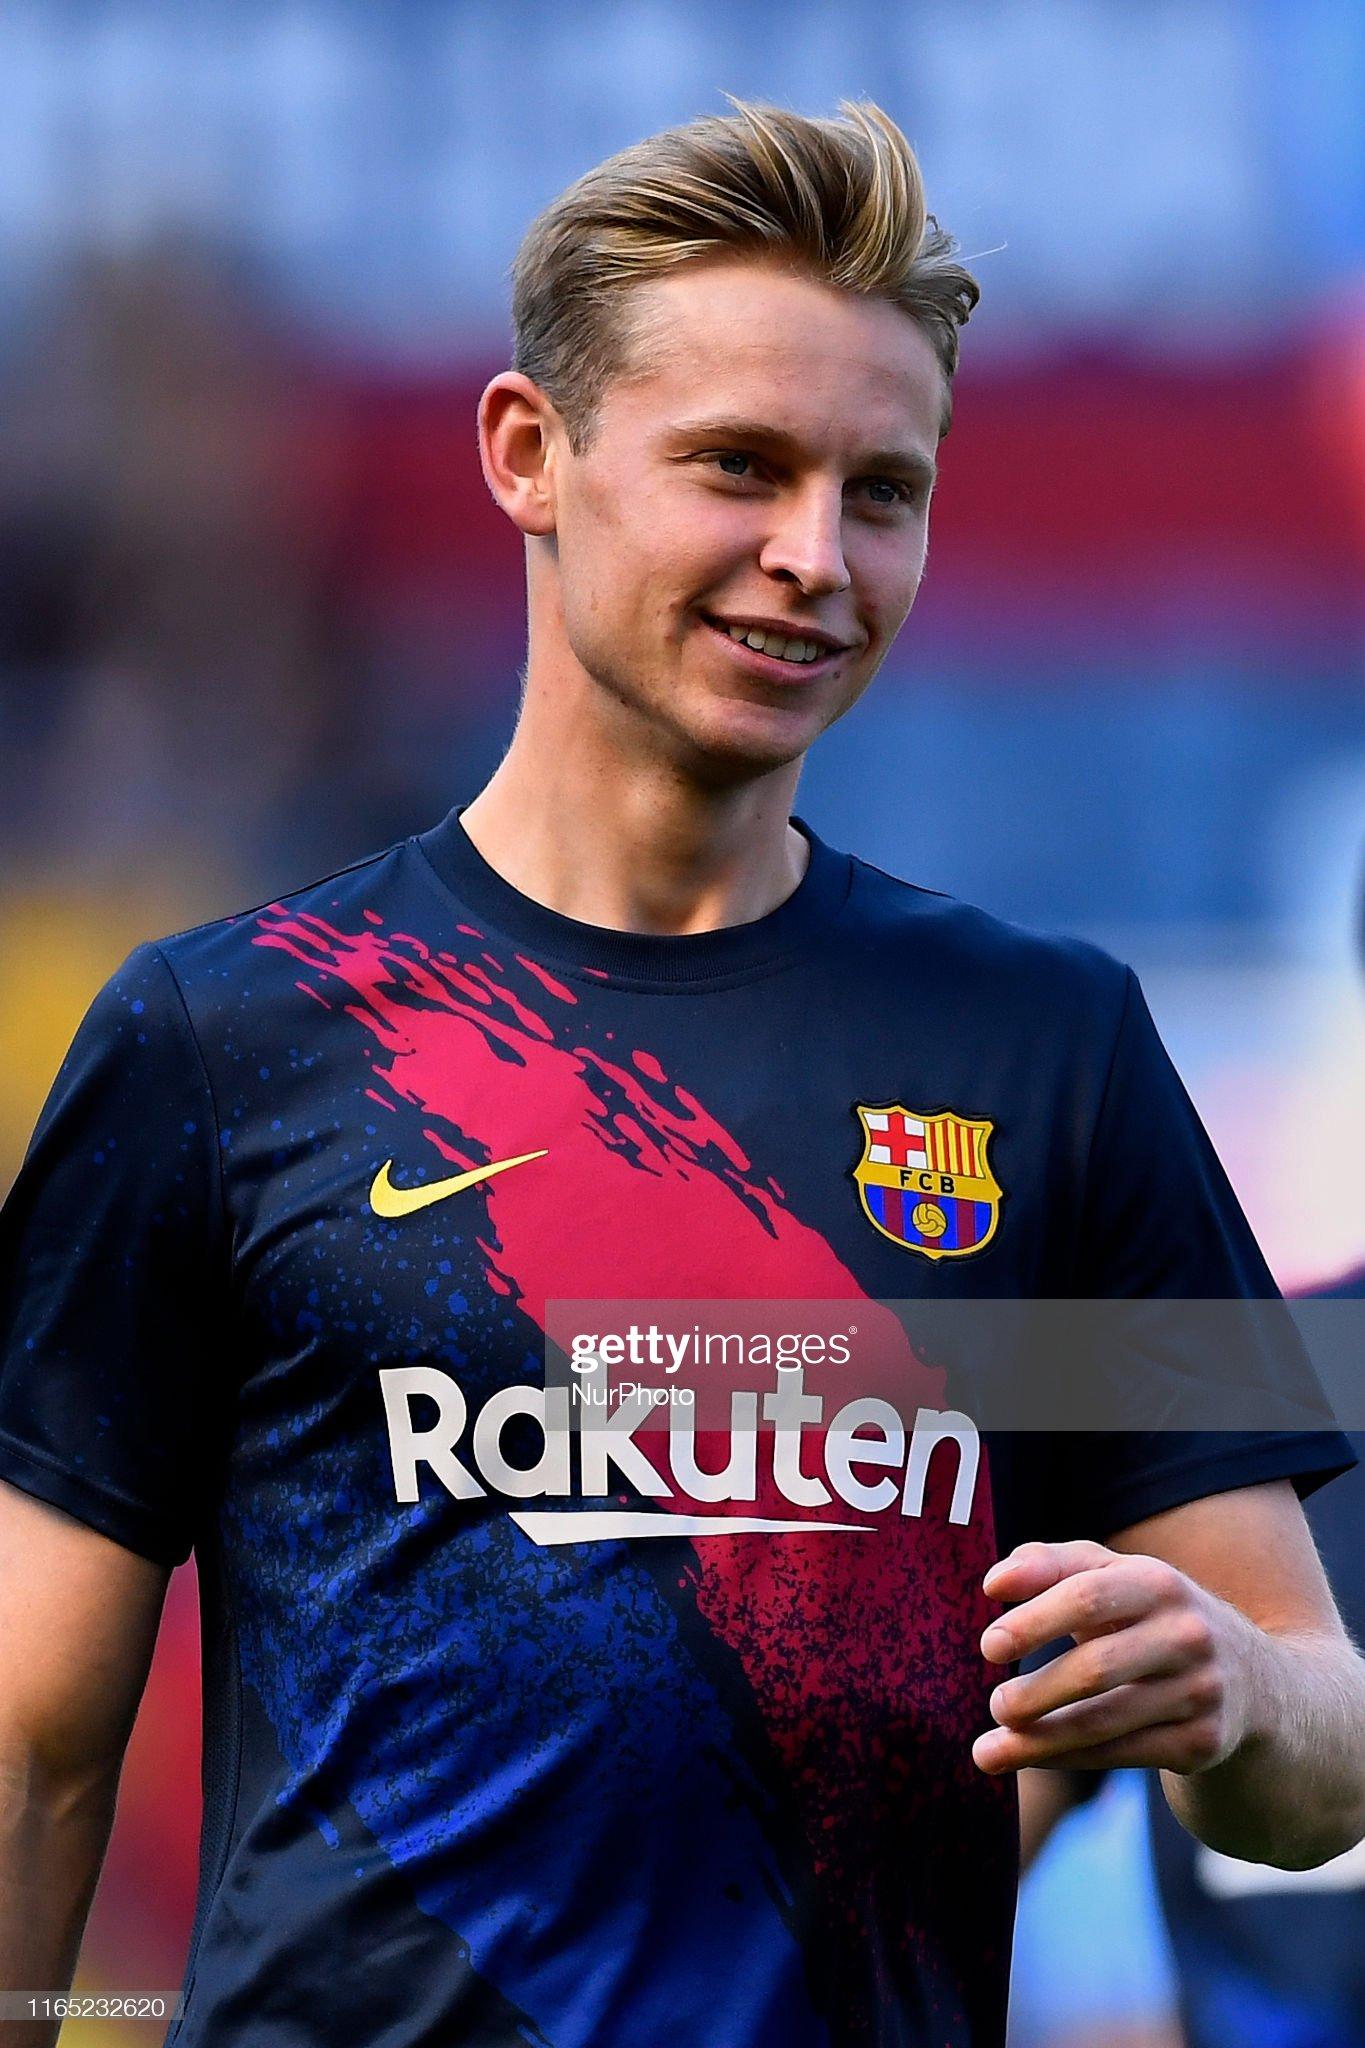 صور مباراة : أوساسونا - برشلونة 2-2 ( 31-08-2019 )  Frenkie-de-jong-of-barcelona-during-the-warmup-before-the-liga-match-picture-id1165232620?s=2048x2048